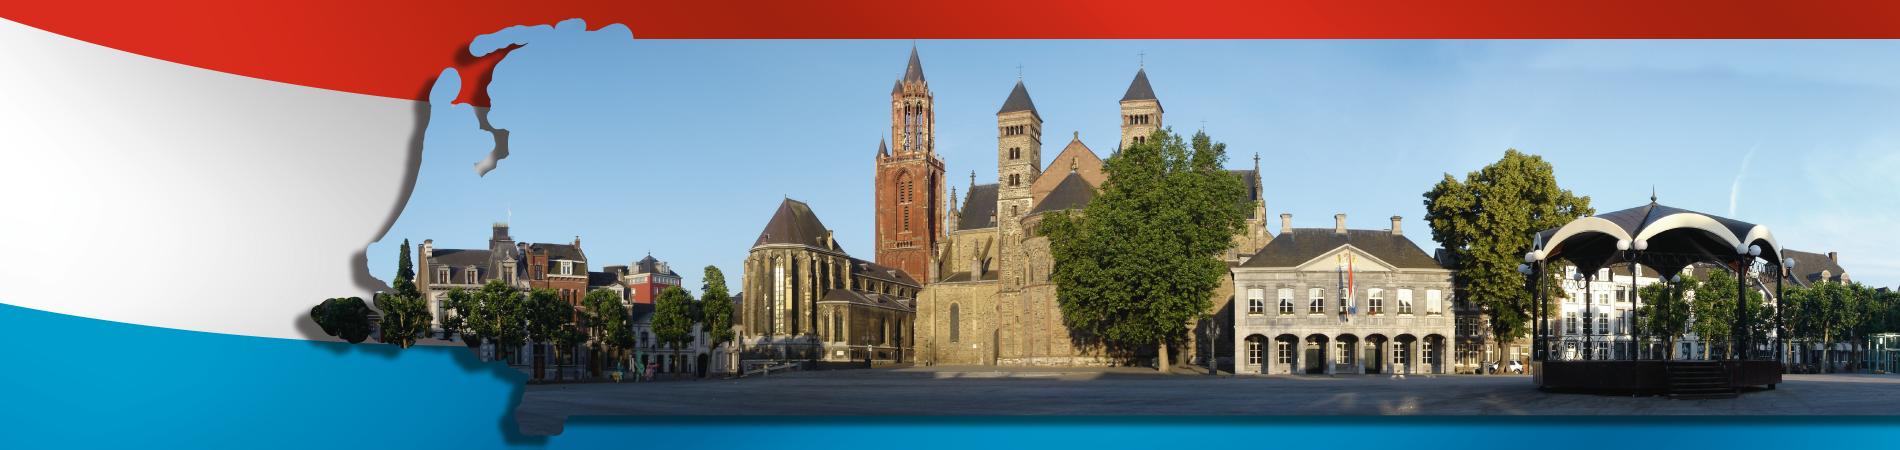 Vrijthof Maastricht service